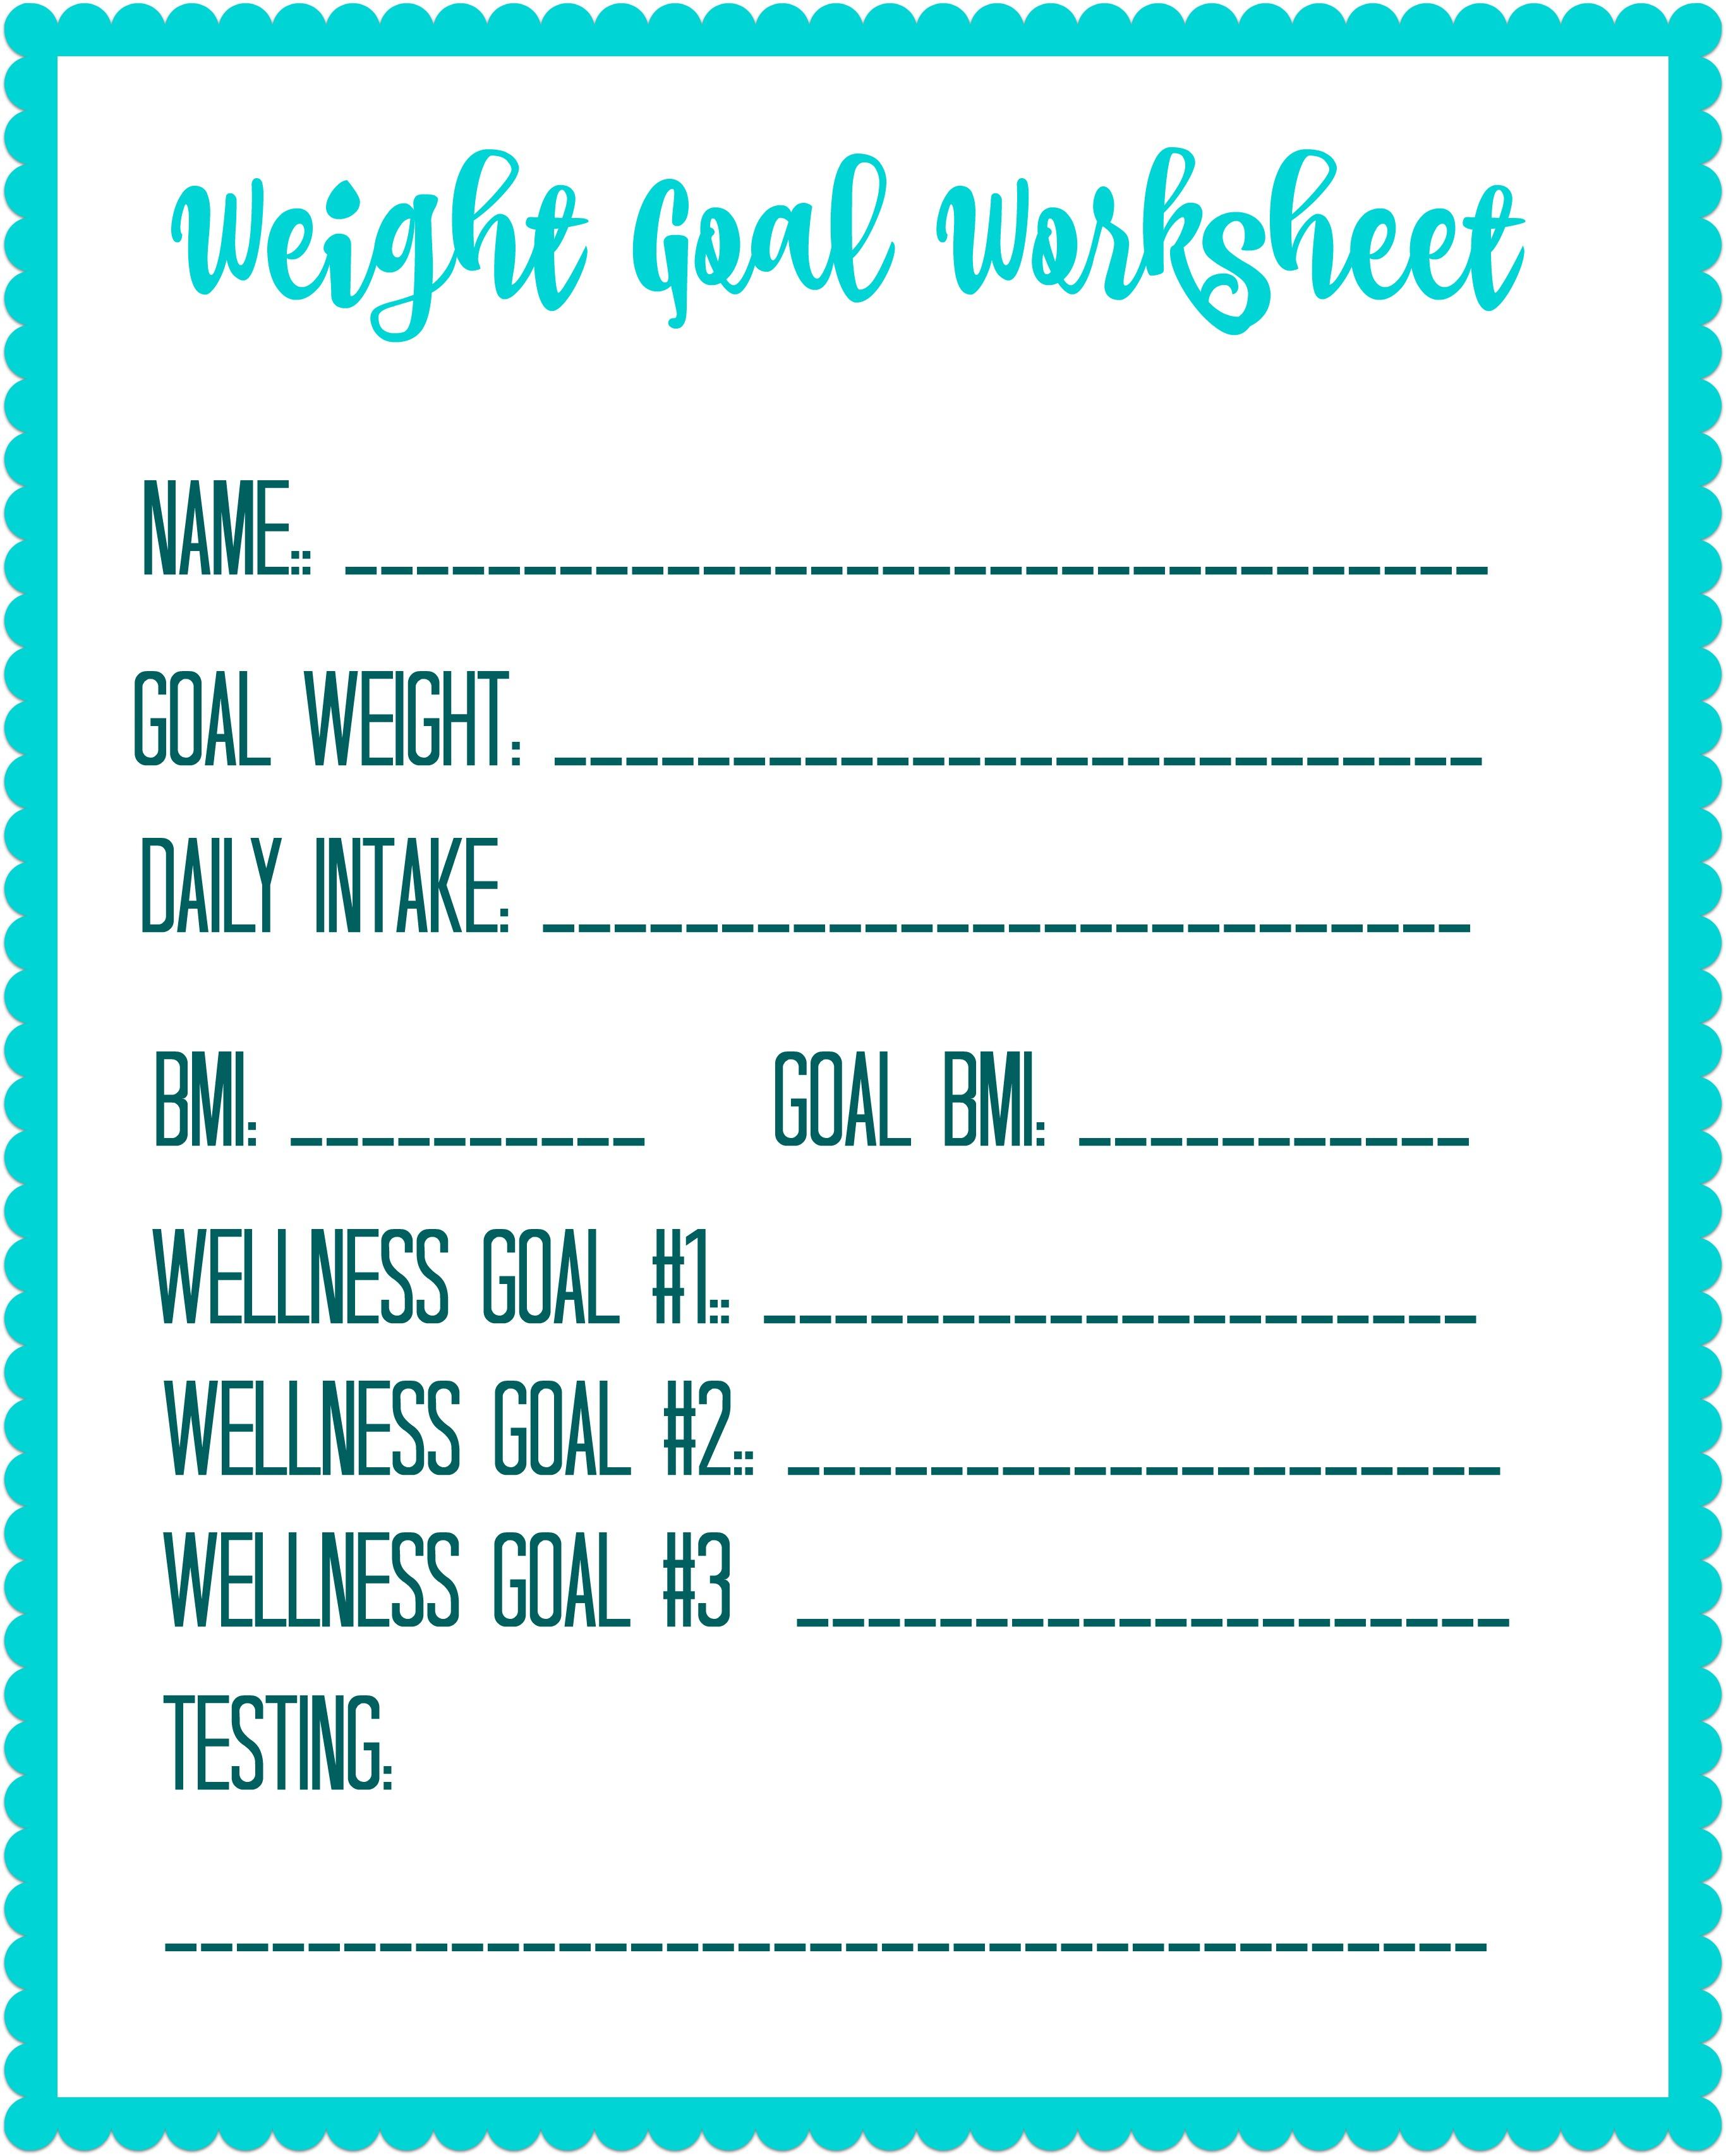 Free Printable Weight Loss Goal Worksheet - Debt Free Spending | Free Printable Calorie Counter Worksheet